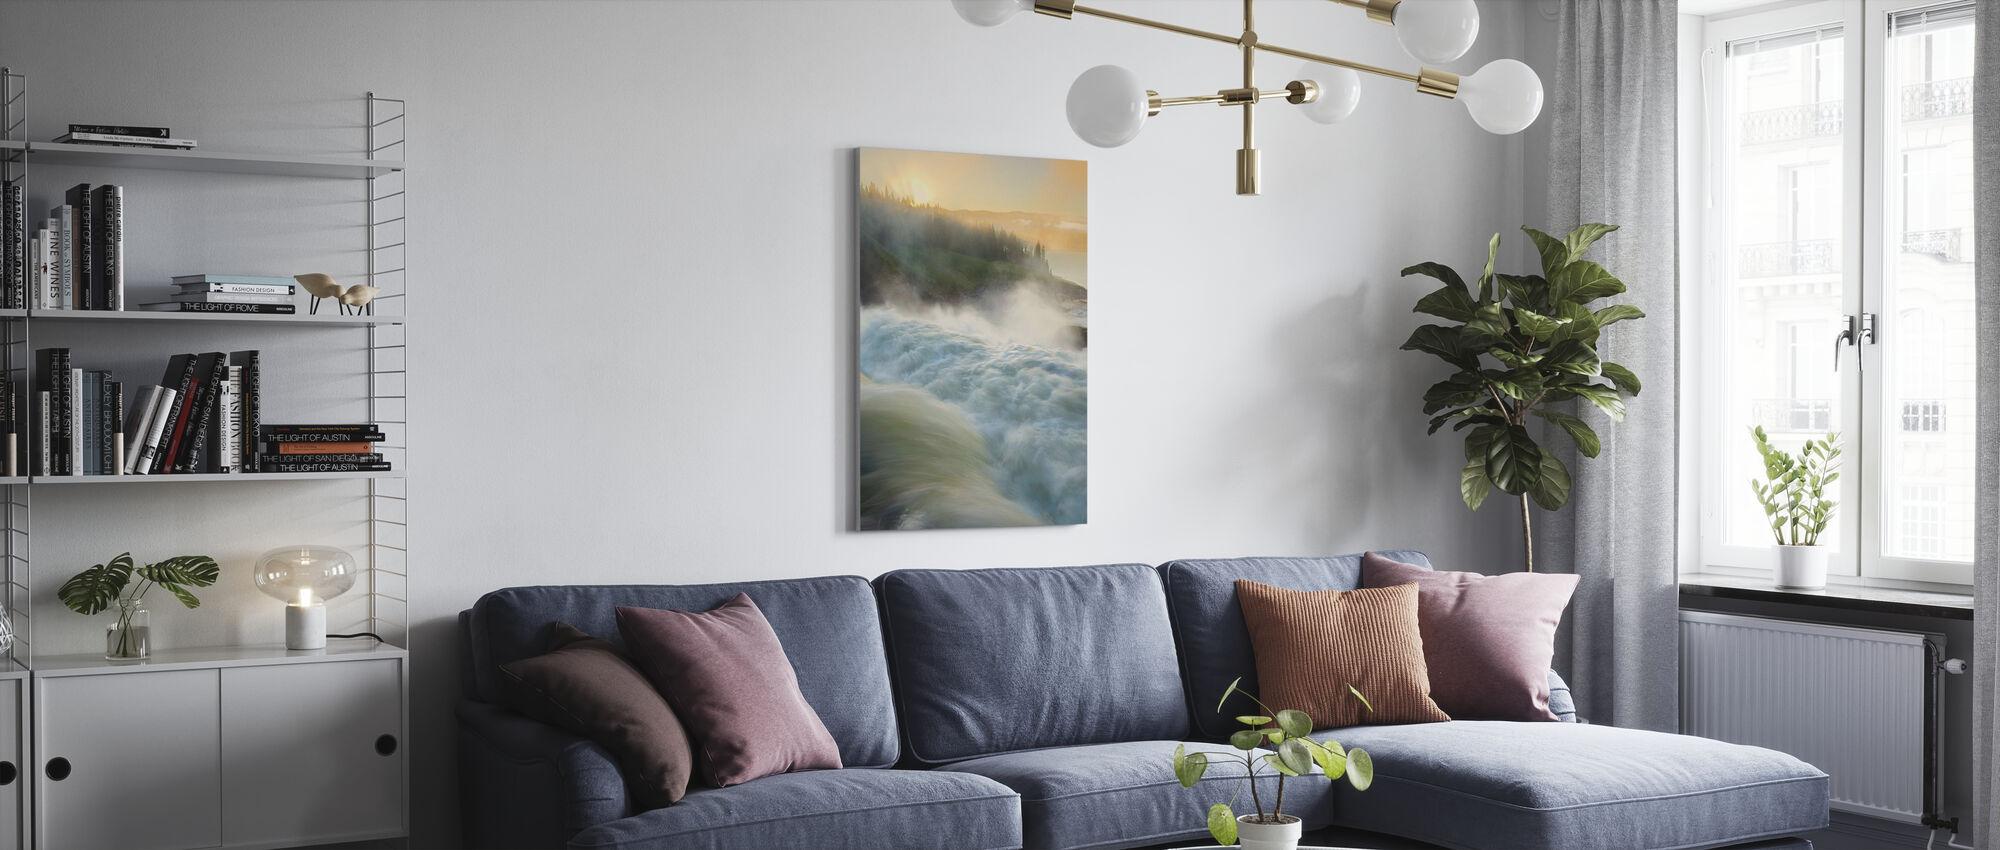 Jämtland River, Sweden - Canvas print - Living Room